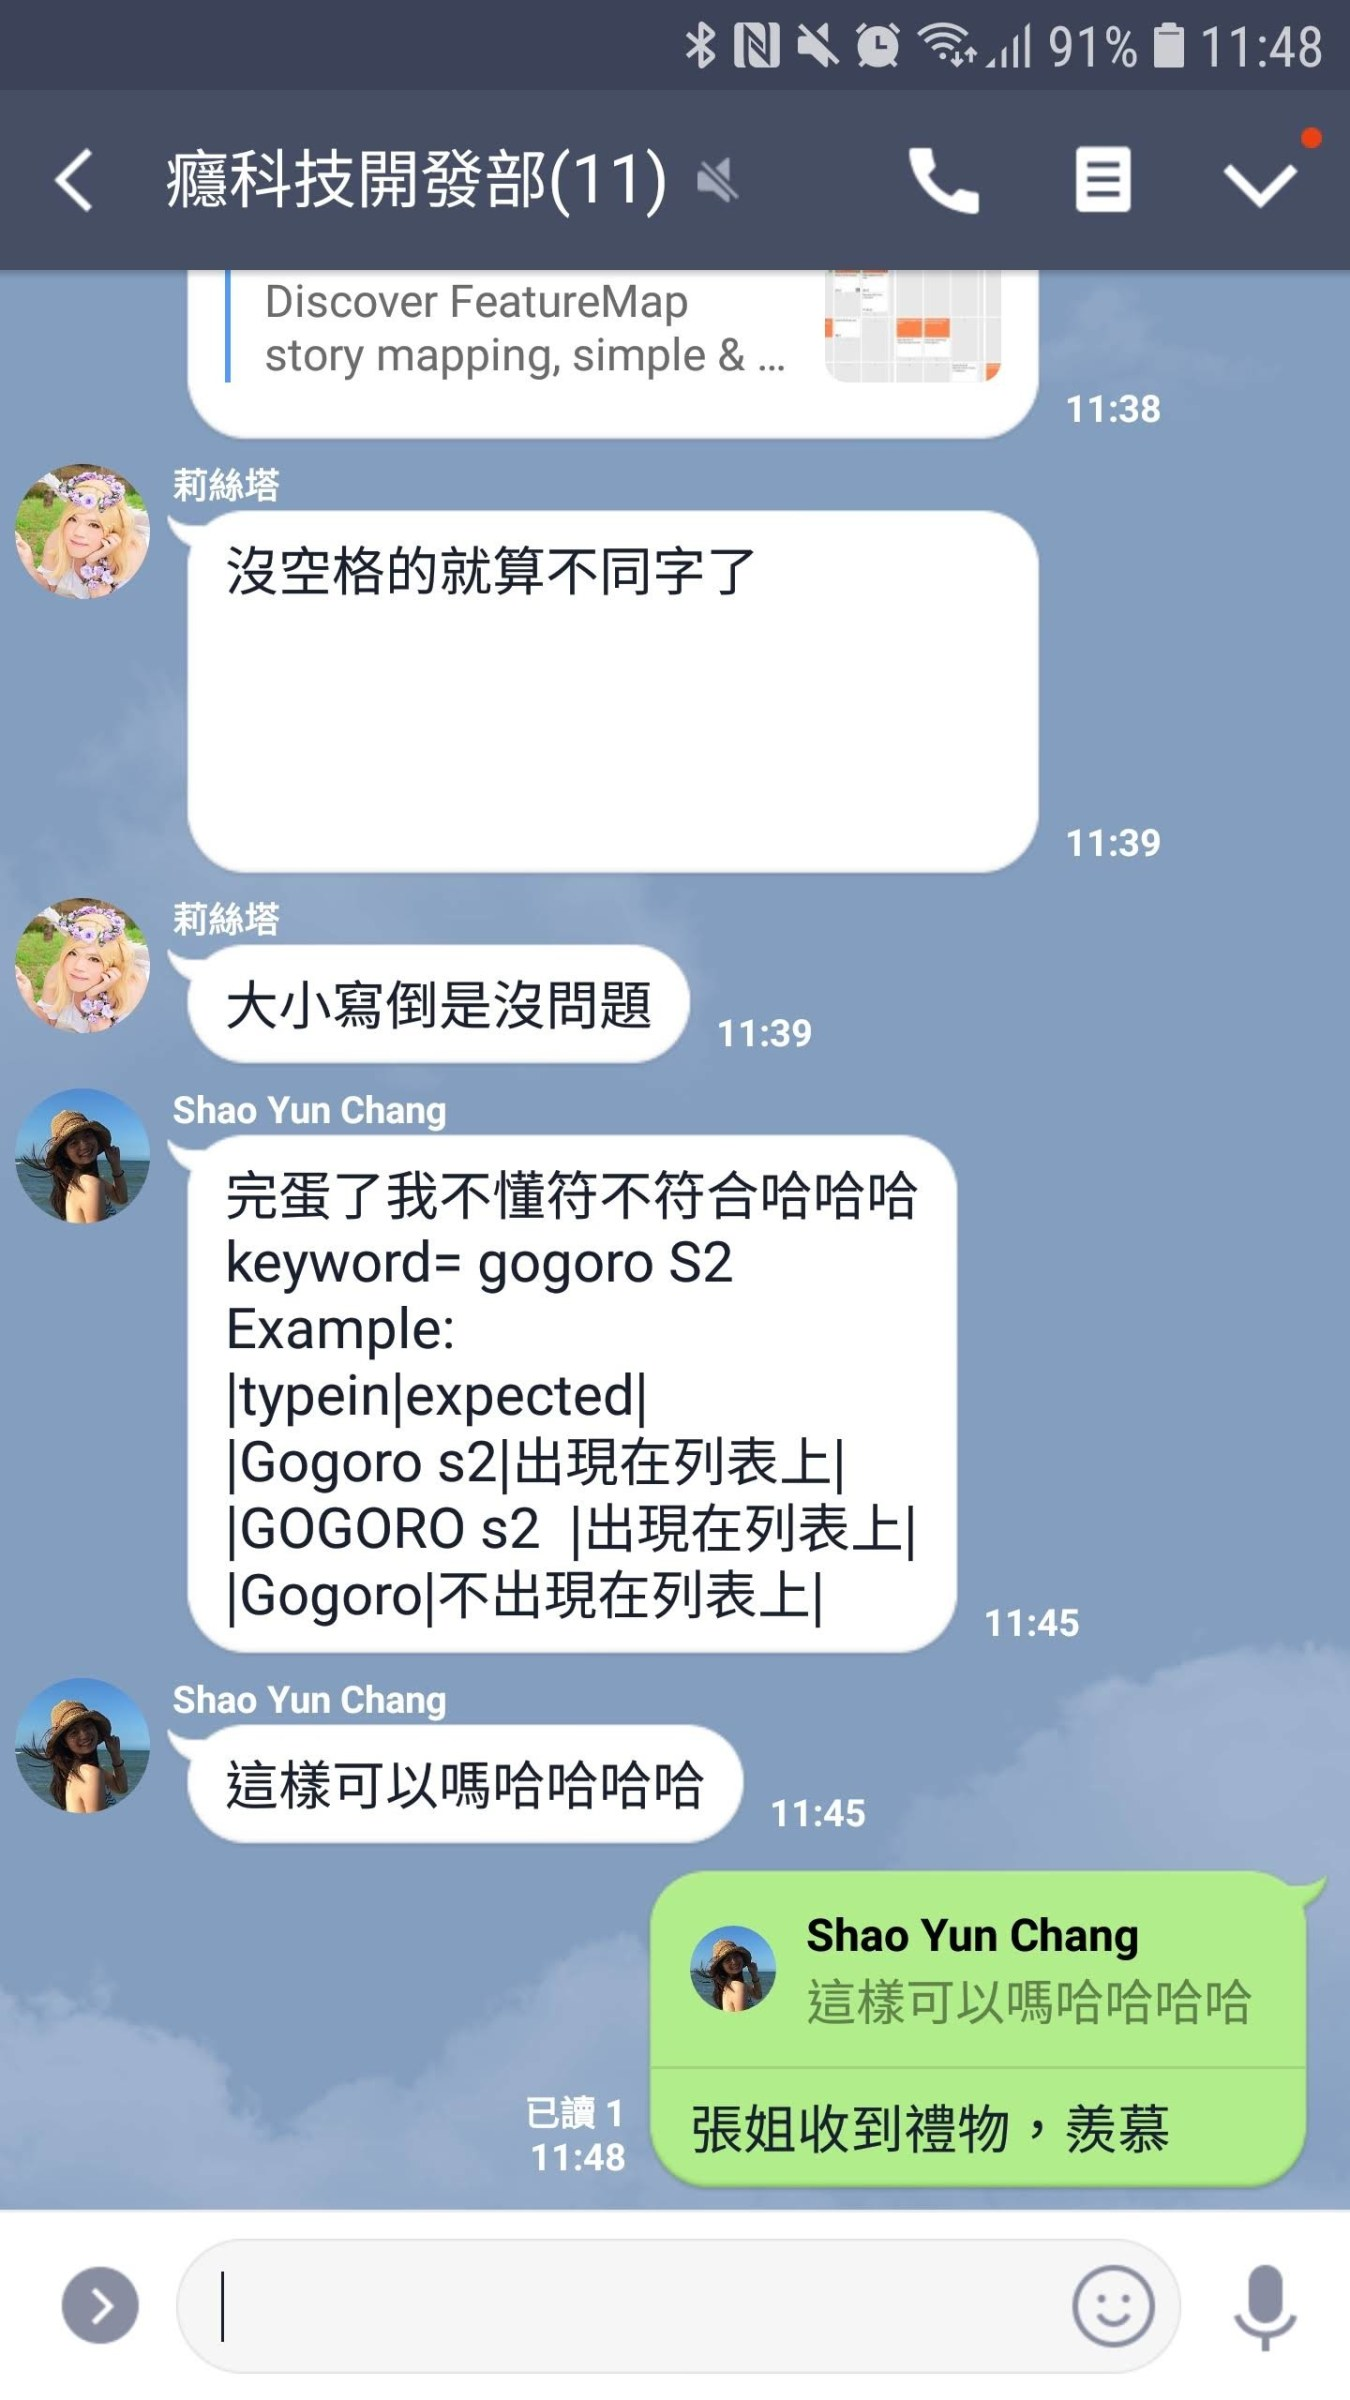 LINE新推出回覆功能 Tag朋友還能引用對話 (136483) - 癮科技 Cool3c